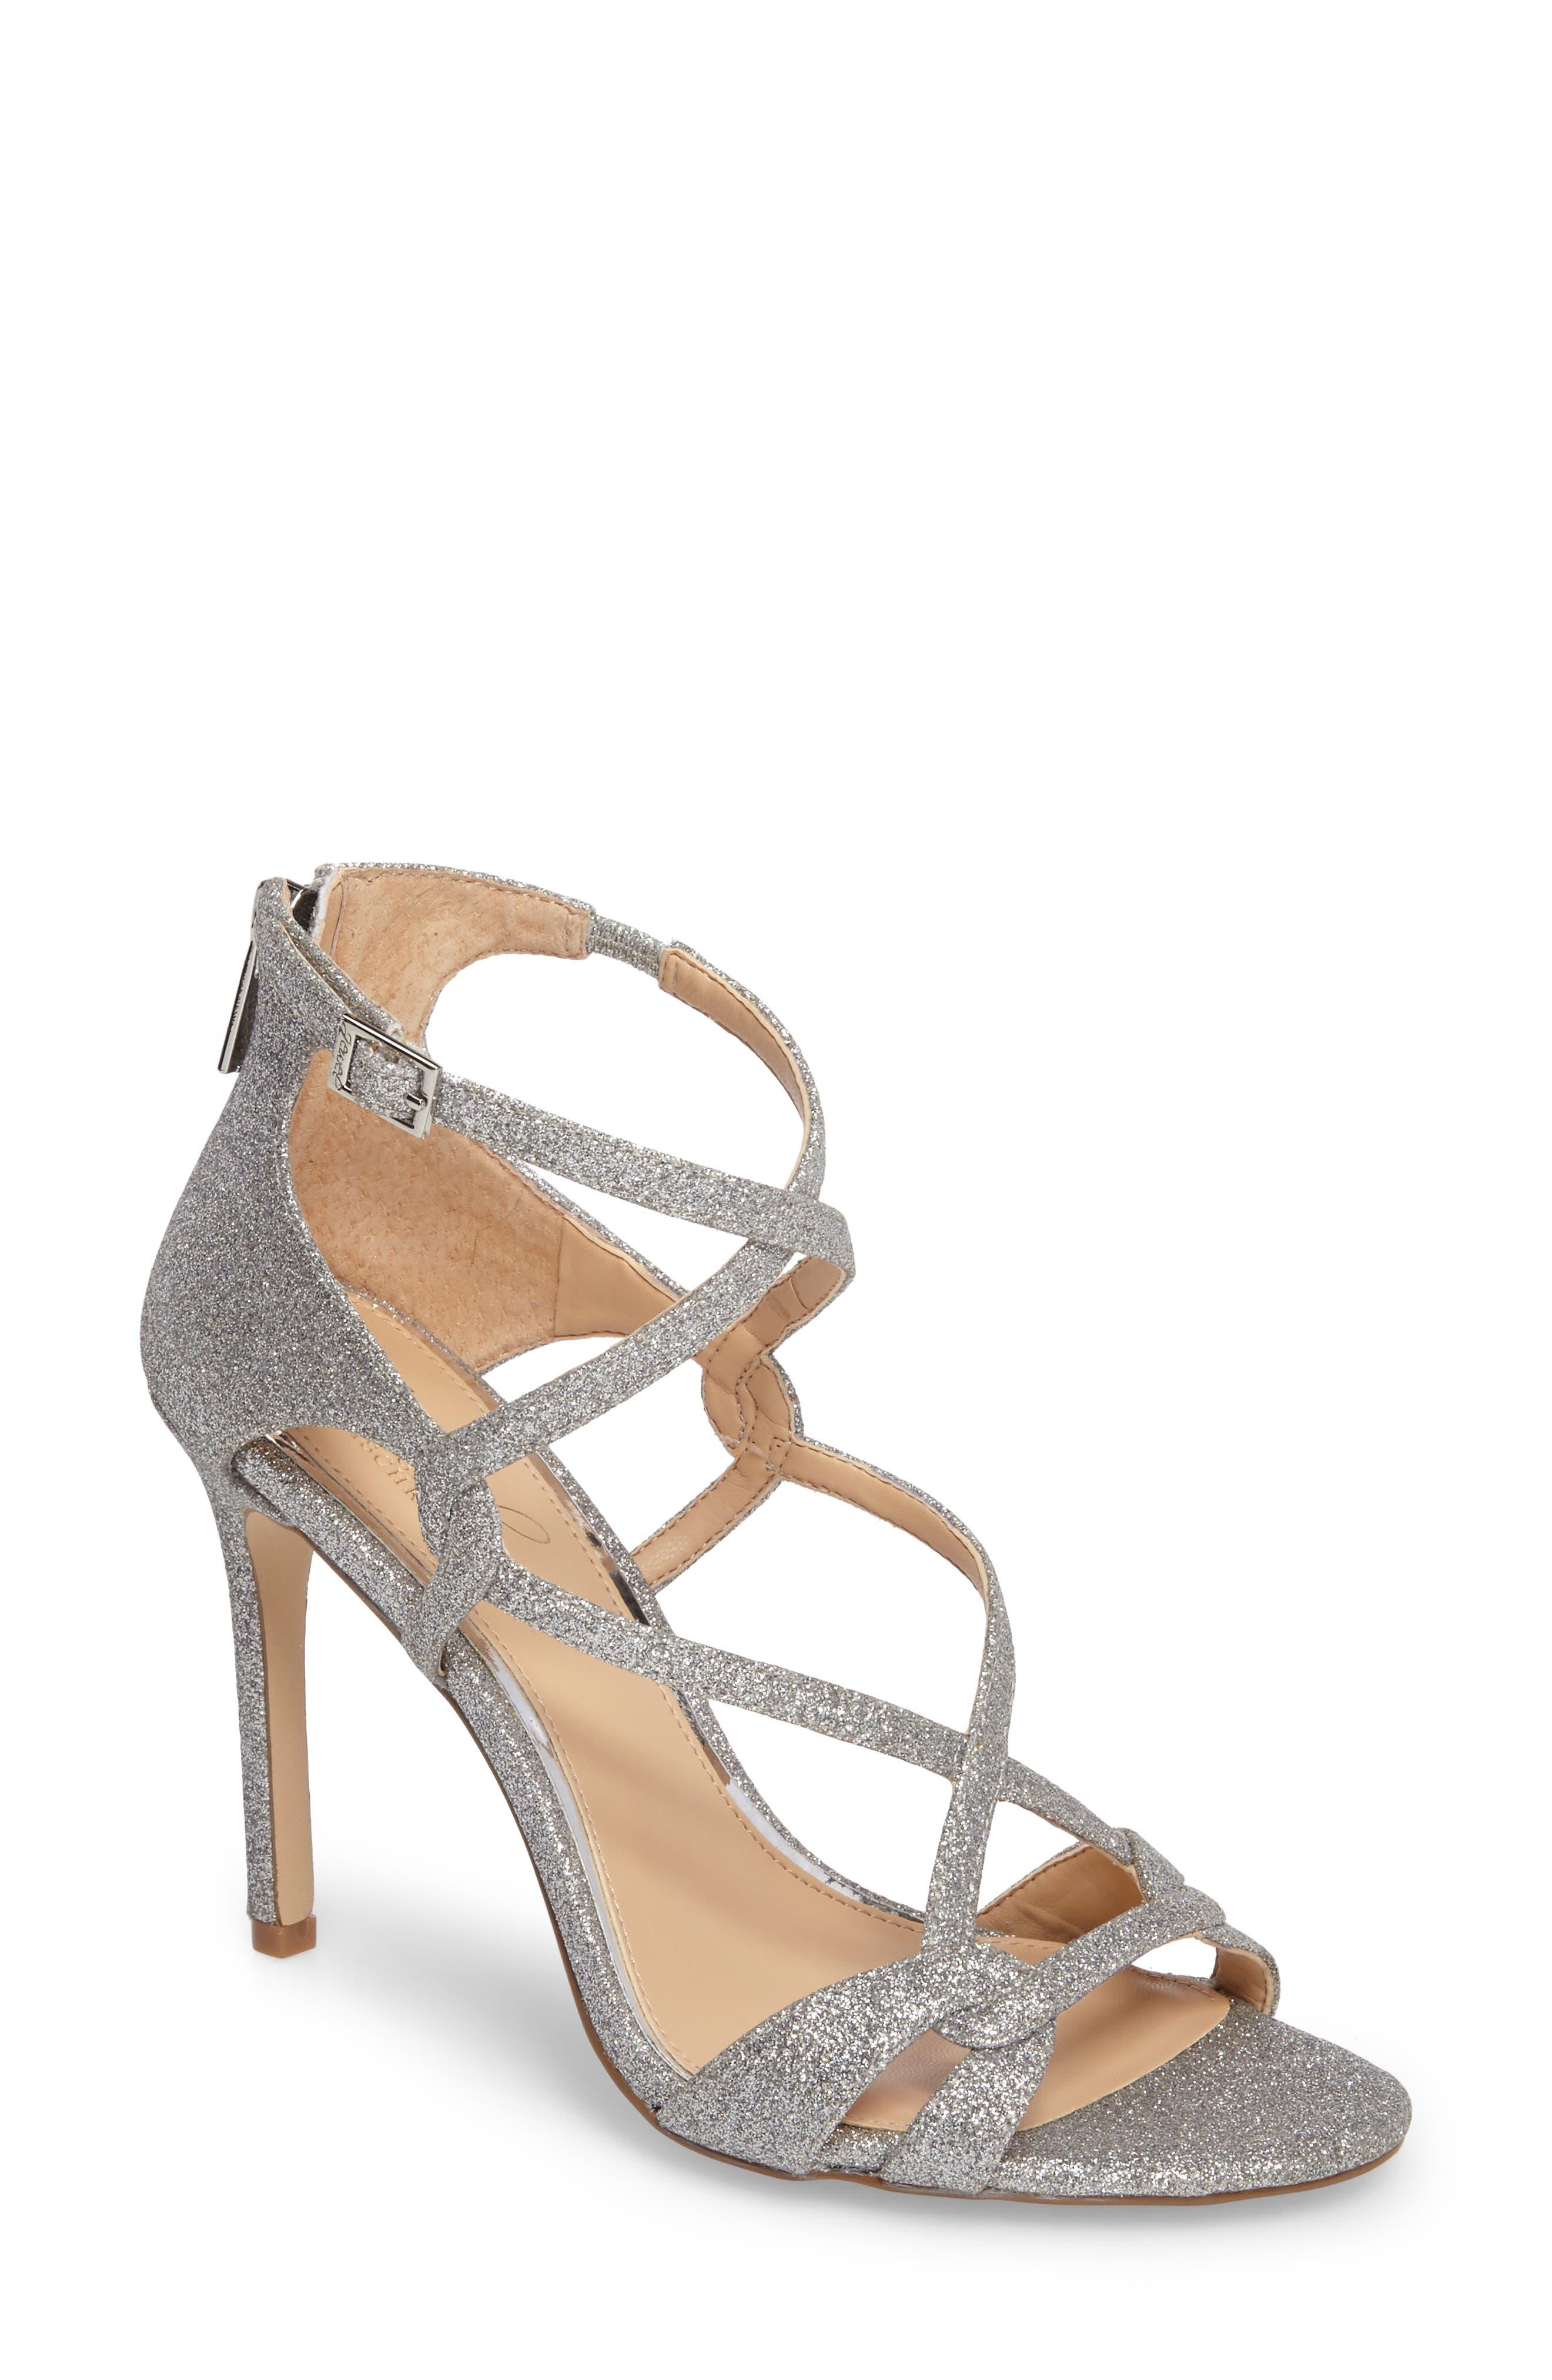 Alternate Image 1 Selected - Jewel Badgley Mischka Aliza Strappy Glitter Sandal (Women)